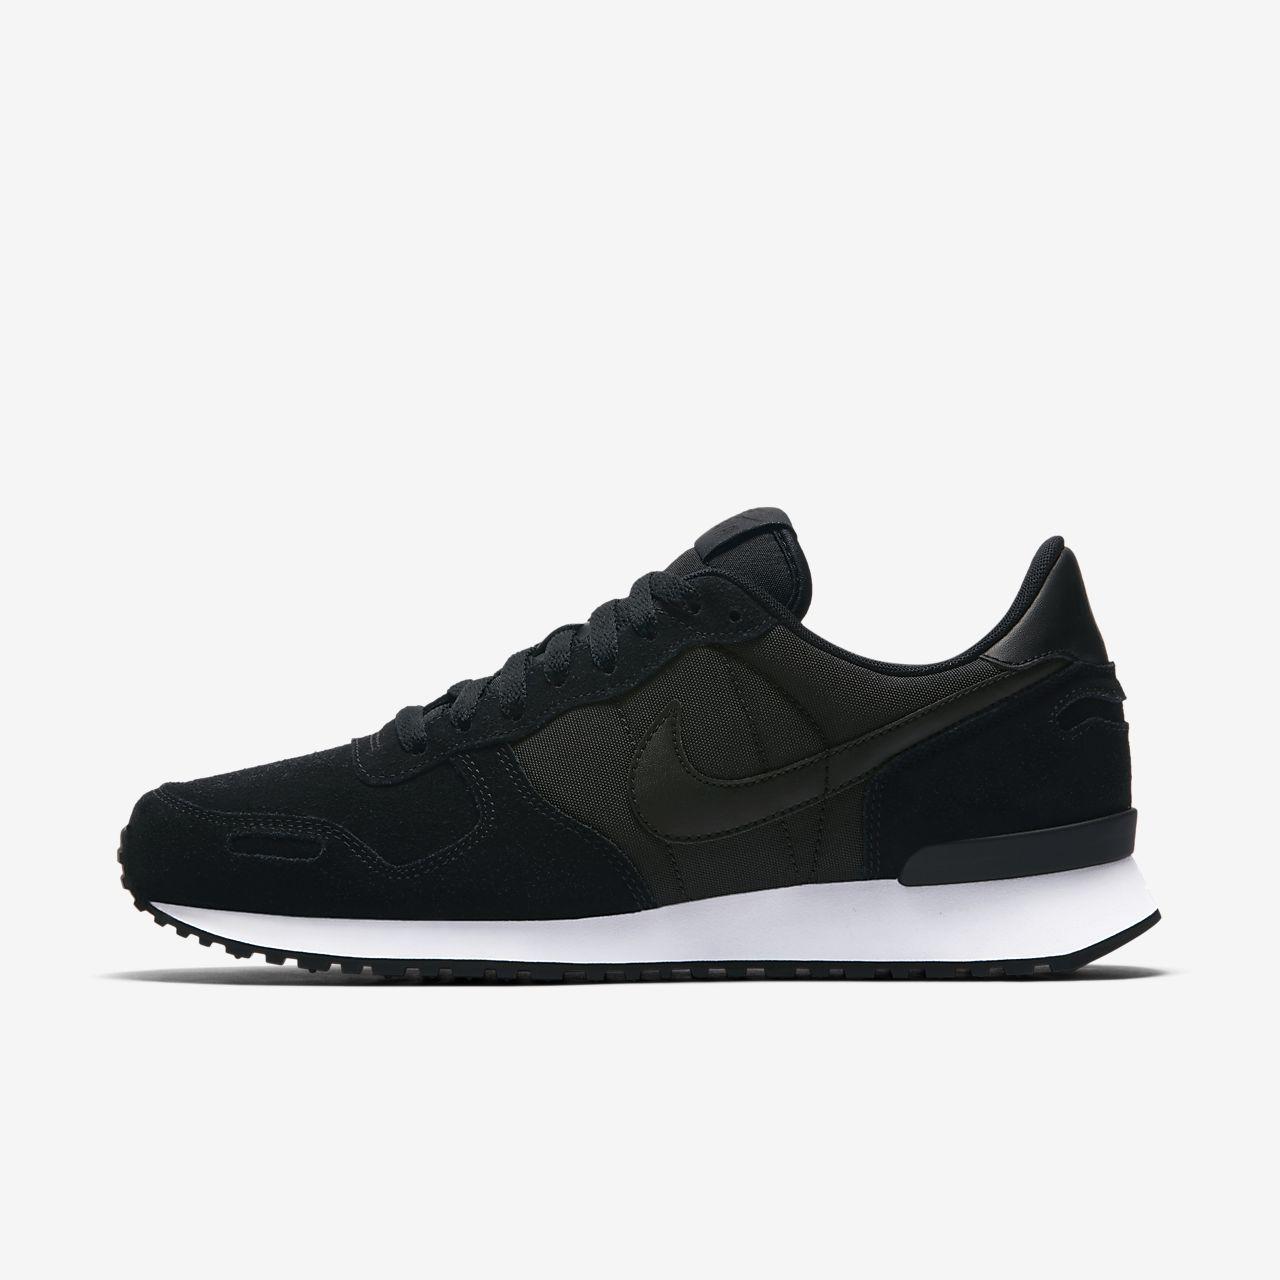 Chaussures Nike Vortex Gris 47 Hommes ILoAnMBS9